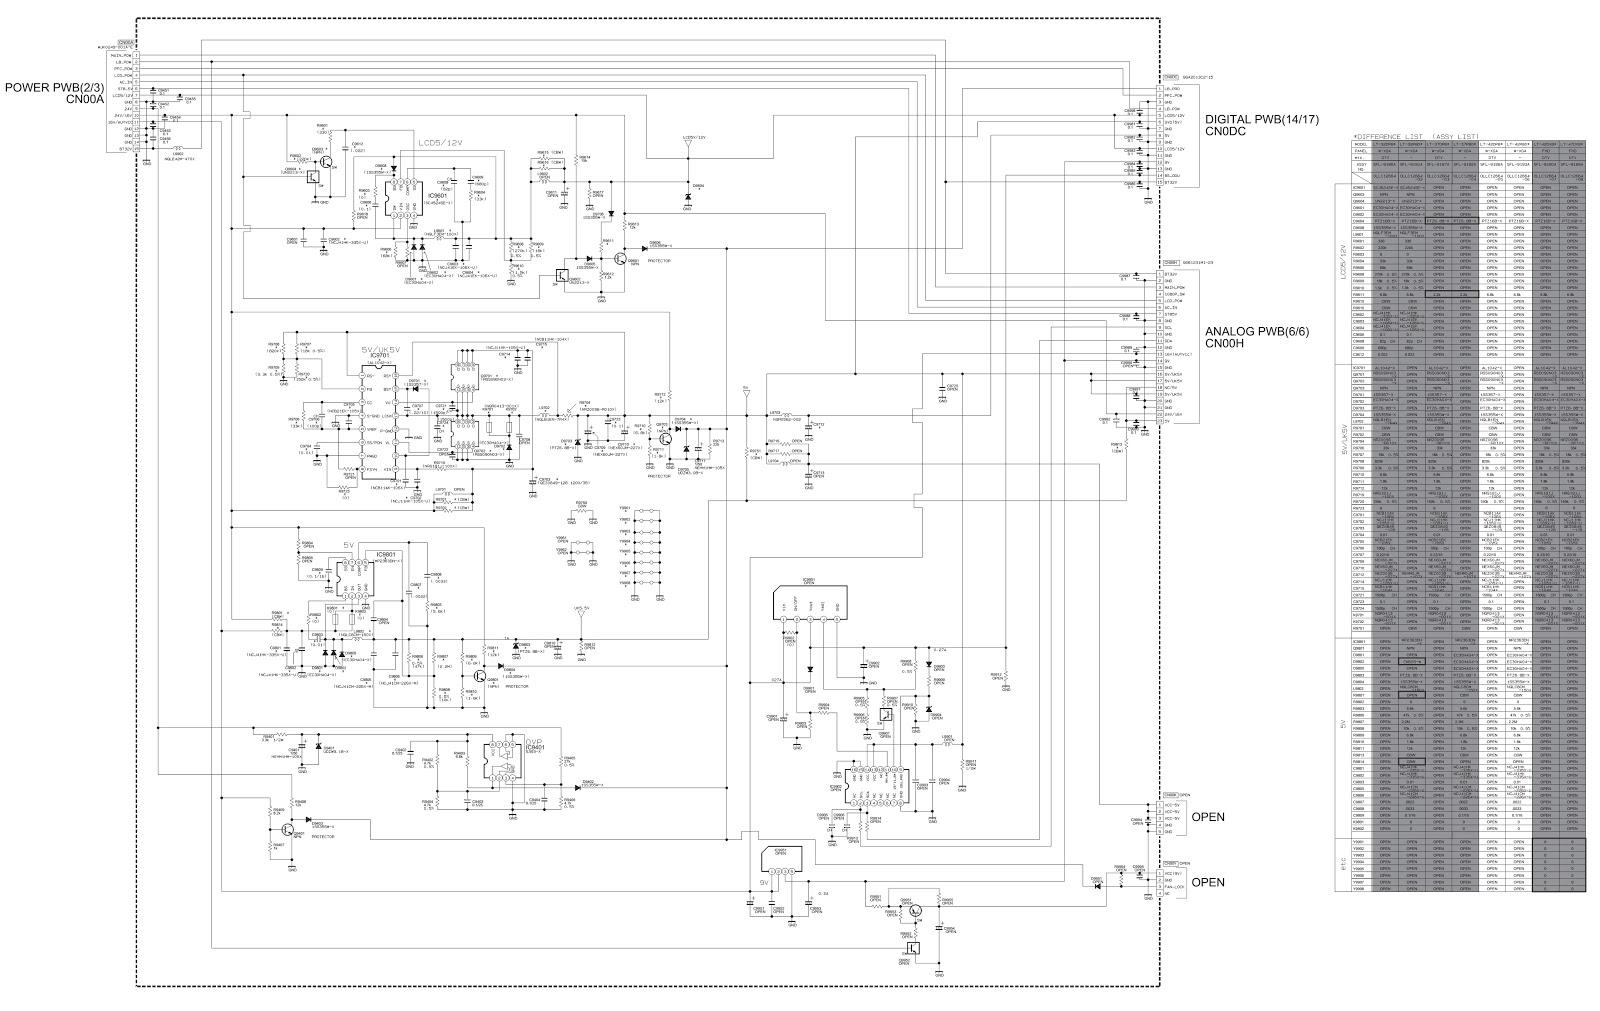 [ANLQ_8698]  Electro help: JVC LT-42P80BU - JVC LT-42DP8BG - SMPS and LED BACK-LIGHT  DRIVER SCHEMATIC | Jvc K Series Circuit Diagram |  | Electro help - blogger